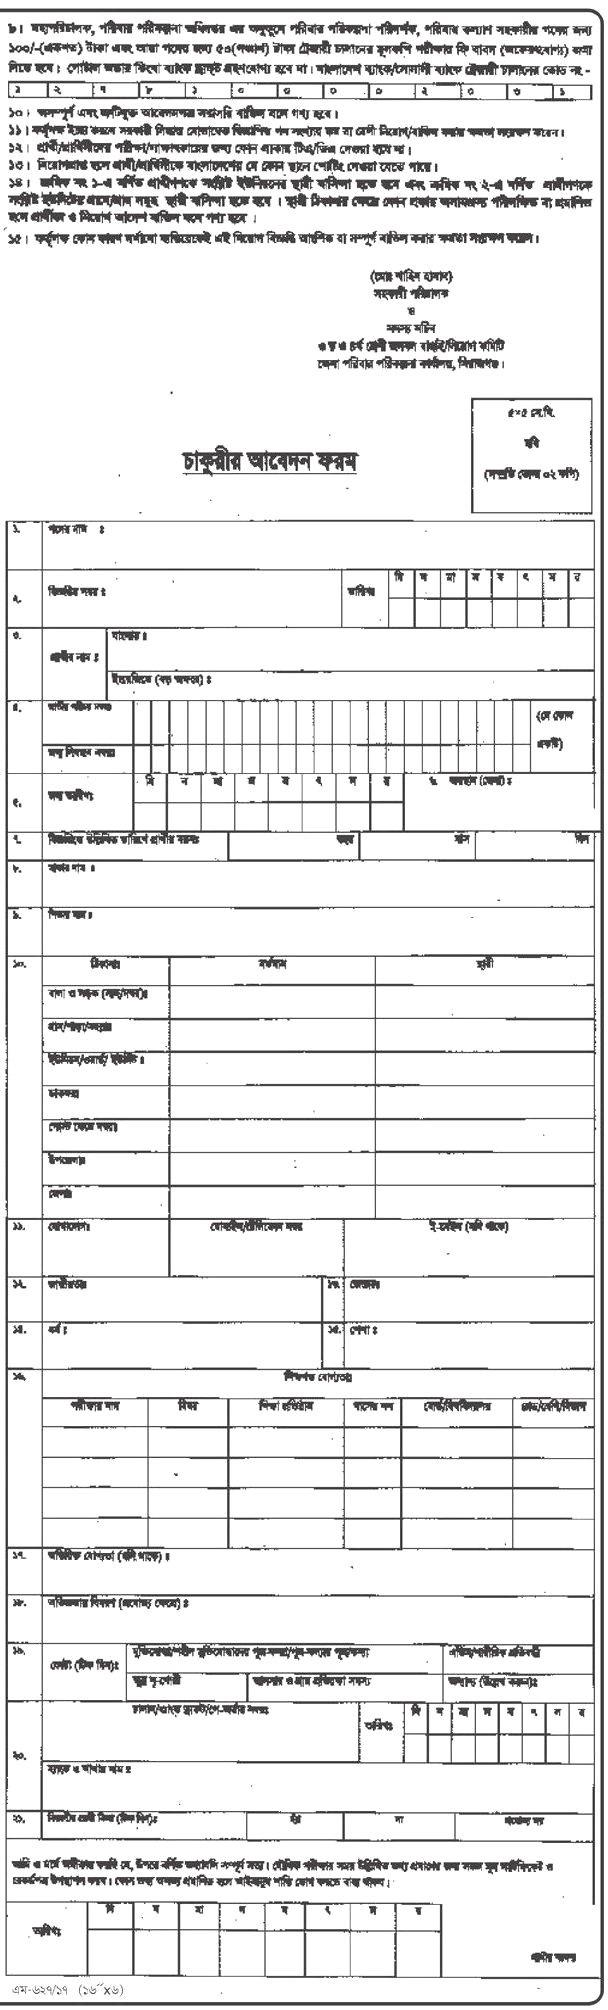 Sirajganj District Family Planning Office Job Circular 2017